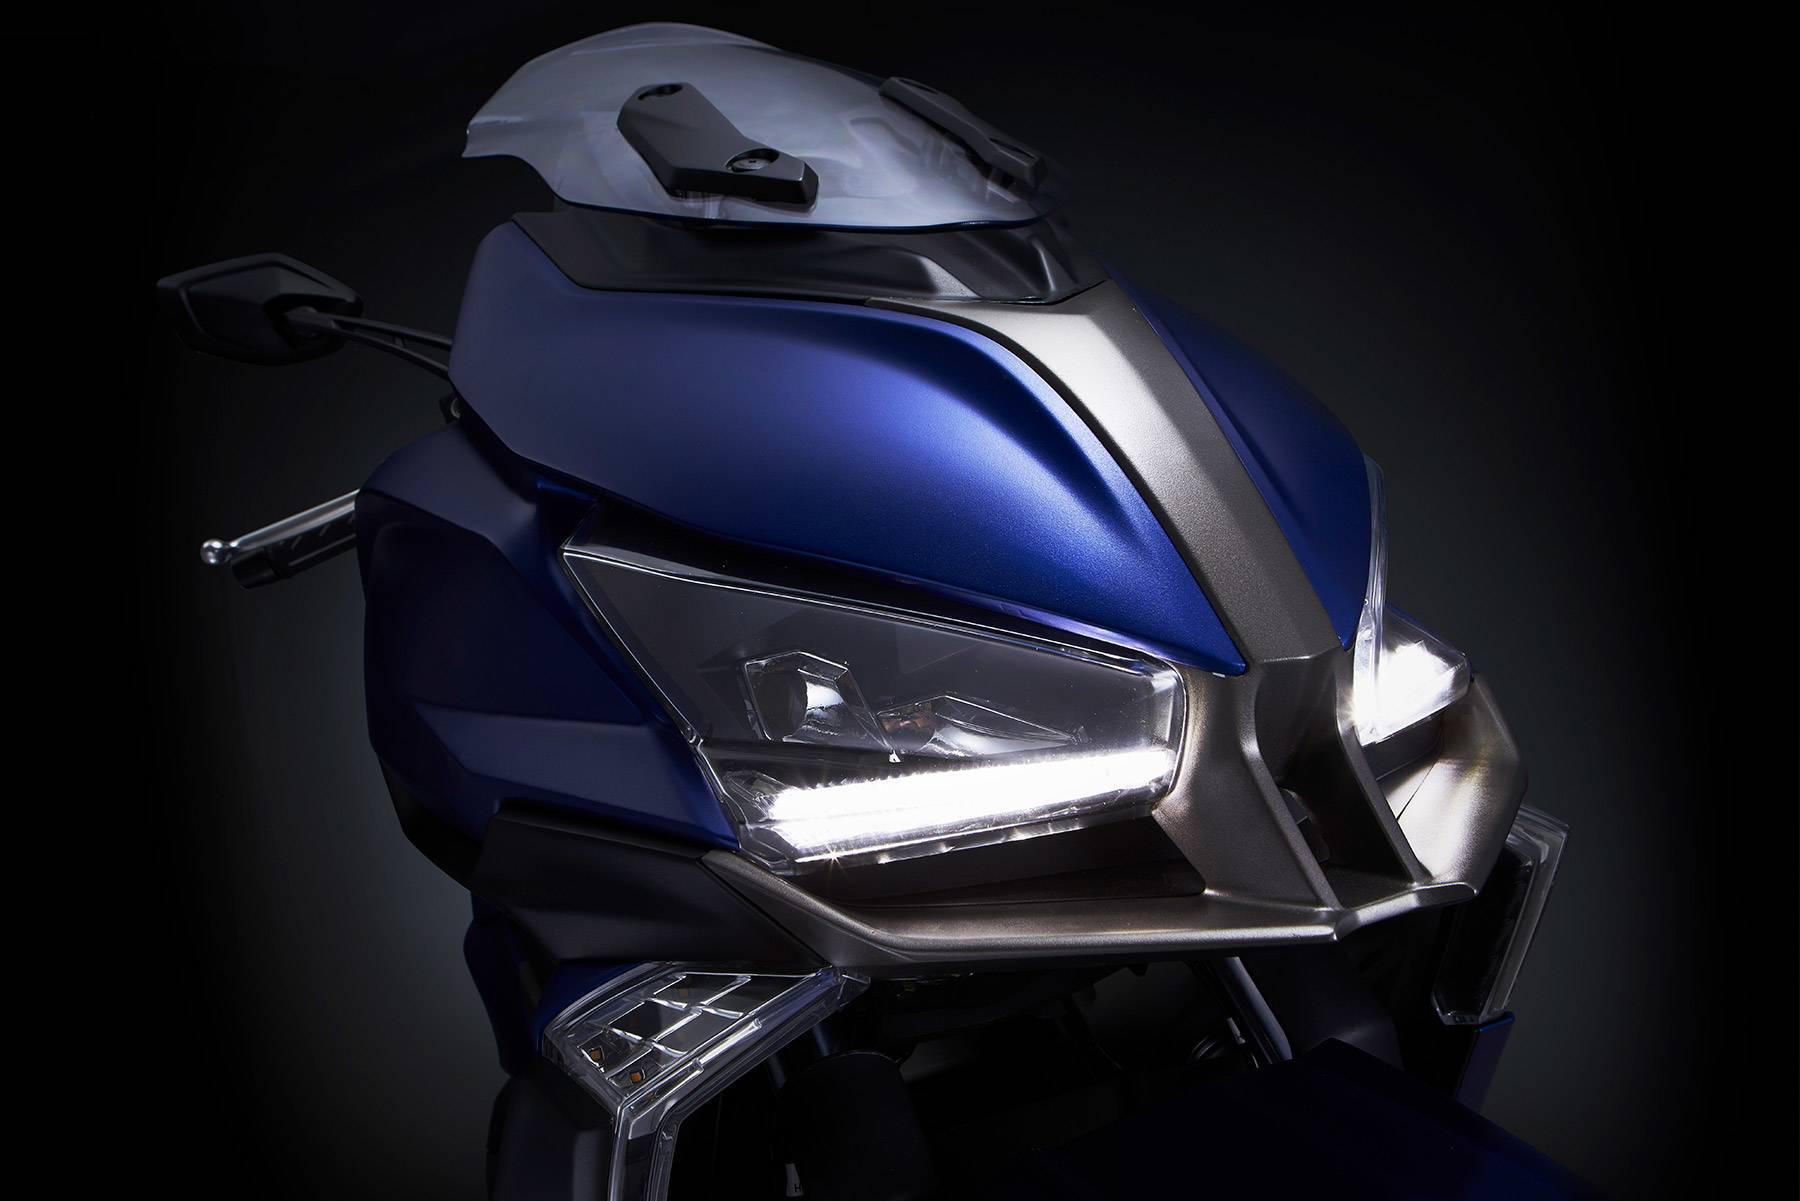 KYMCO Xciting 400 S 2018 y KYMCO CV2, CV3 Concept - Motorbike Magazine